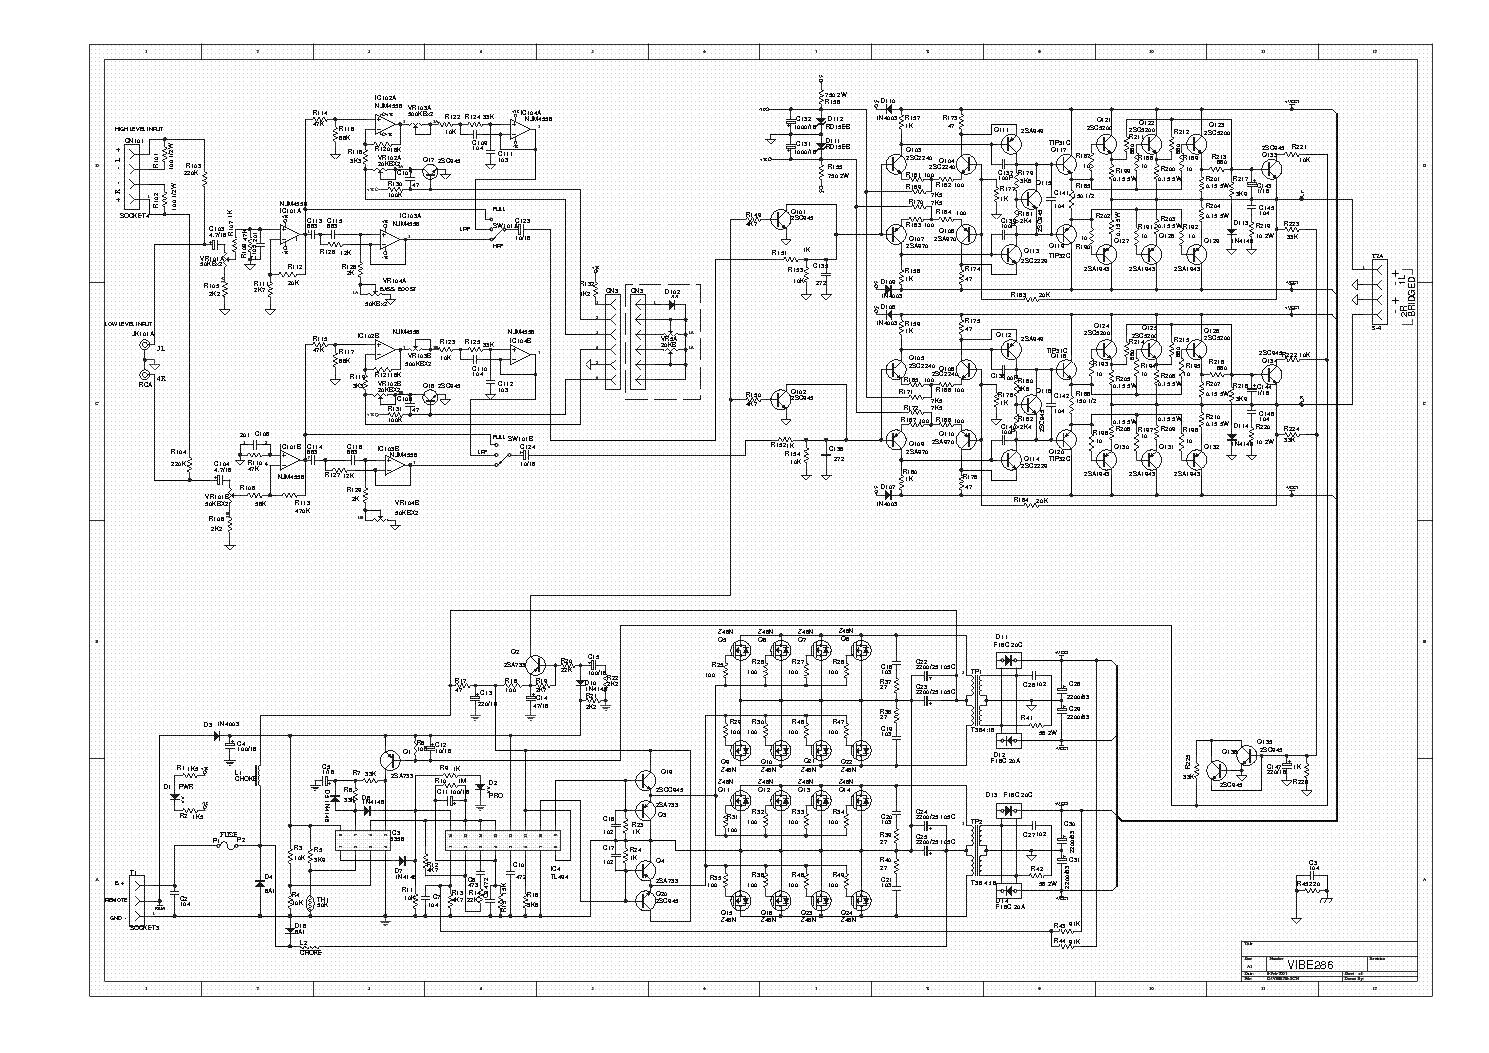 service repair workshop manuals autos post. Black Bedroom Furniture Sets. Home Design Ideas